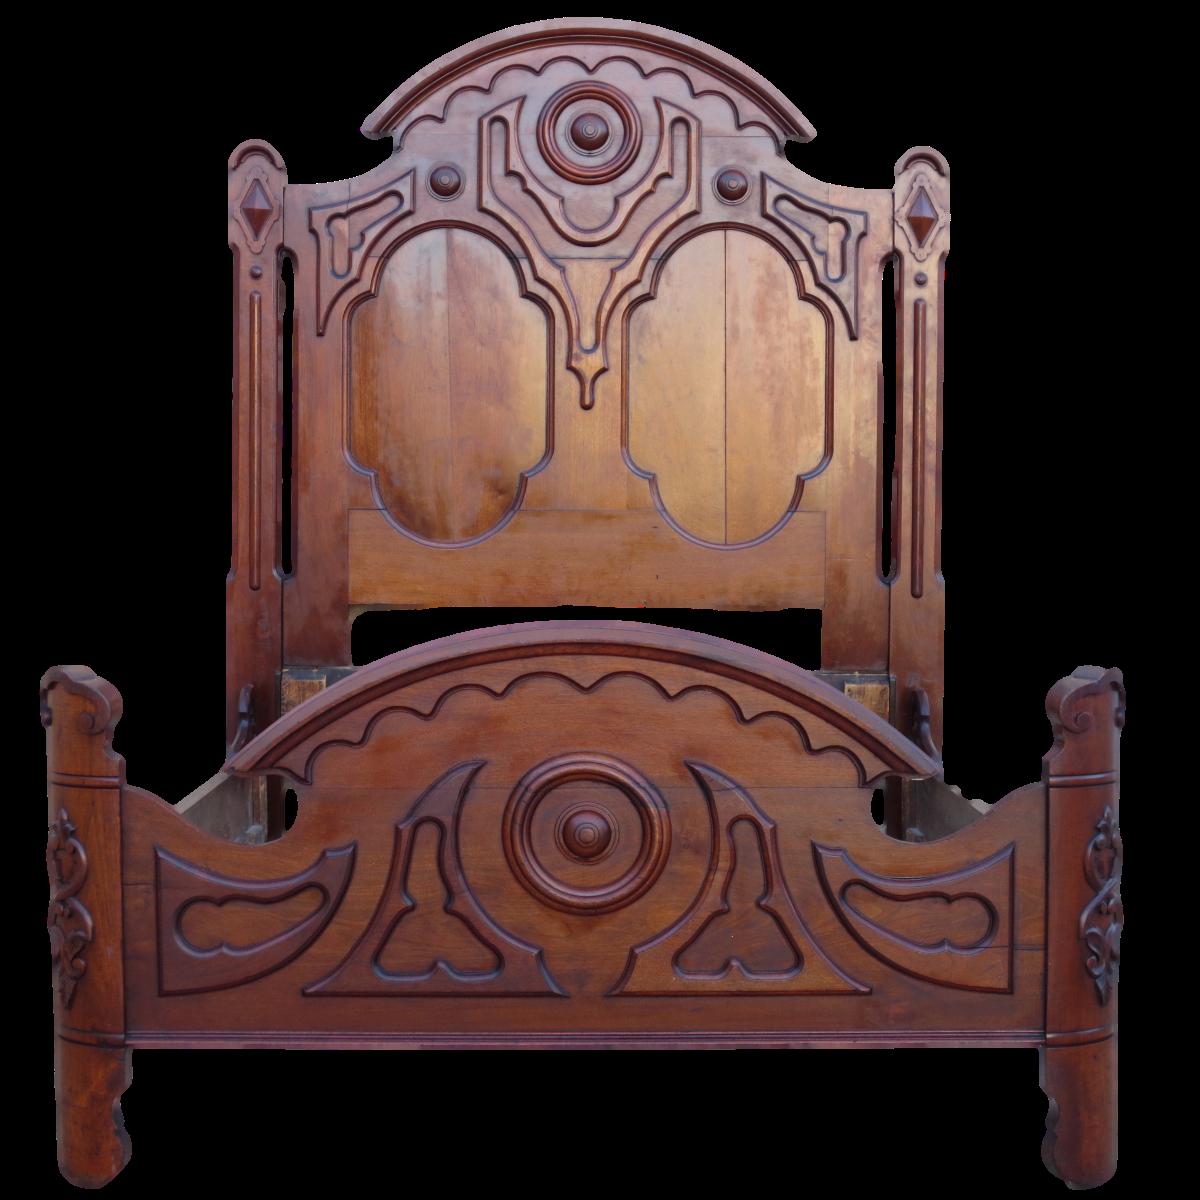 victorian bedroom furniture. Antique Victorian Bedroom Furniture - Simple Interior Design For Check More At Http://www.magic009.com/antique-victorian-bedroom-furniture/